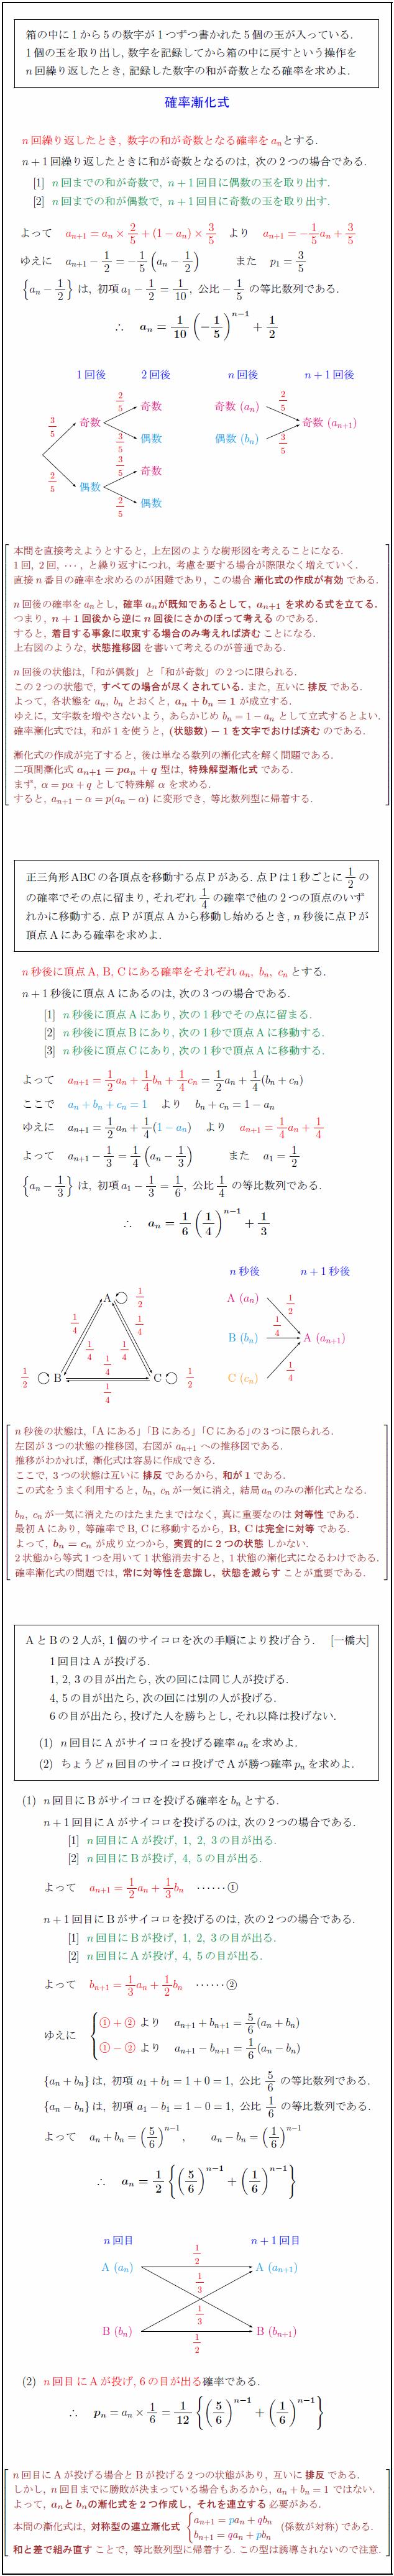 probability-recurrence-formula